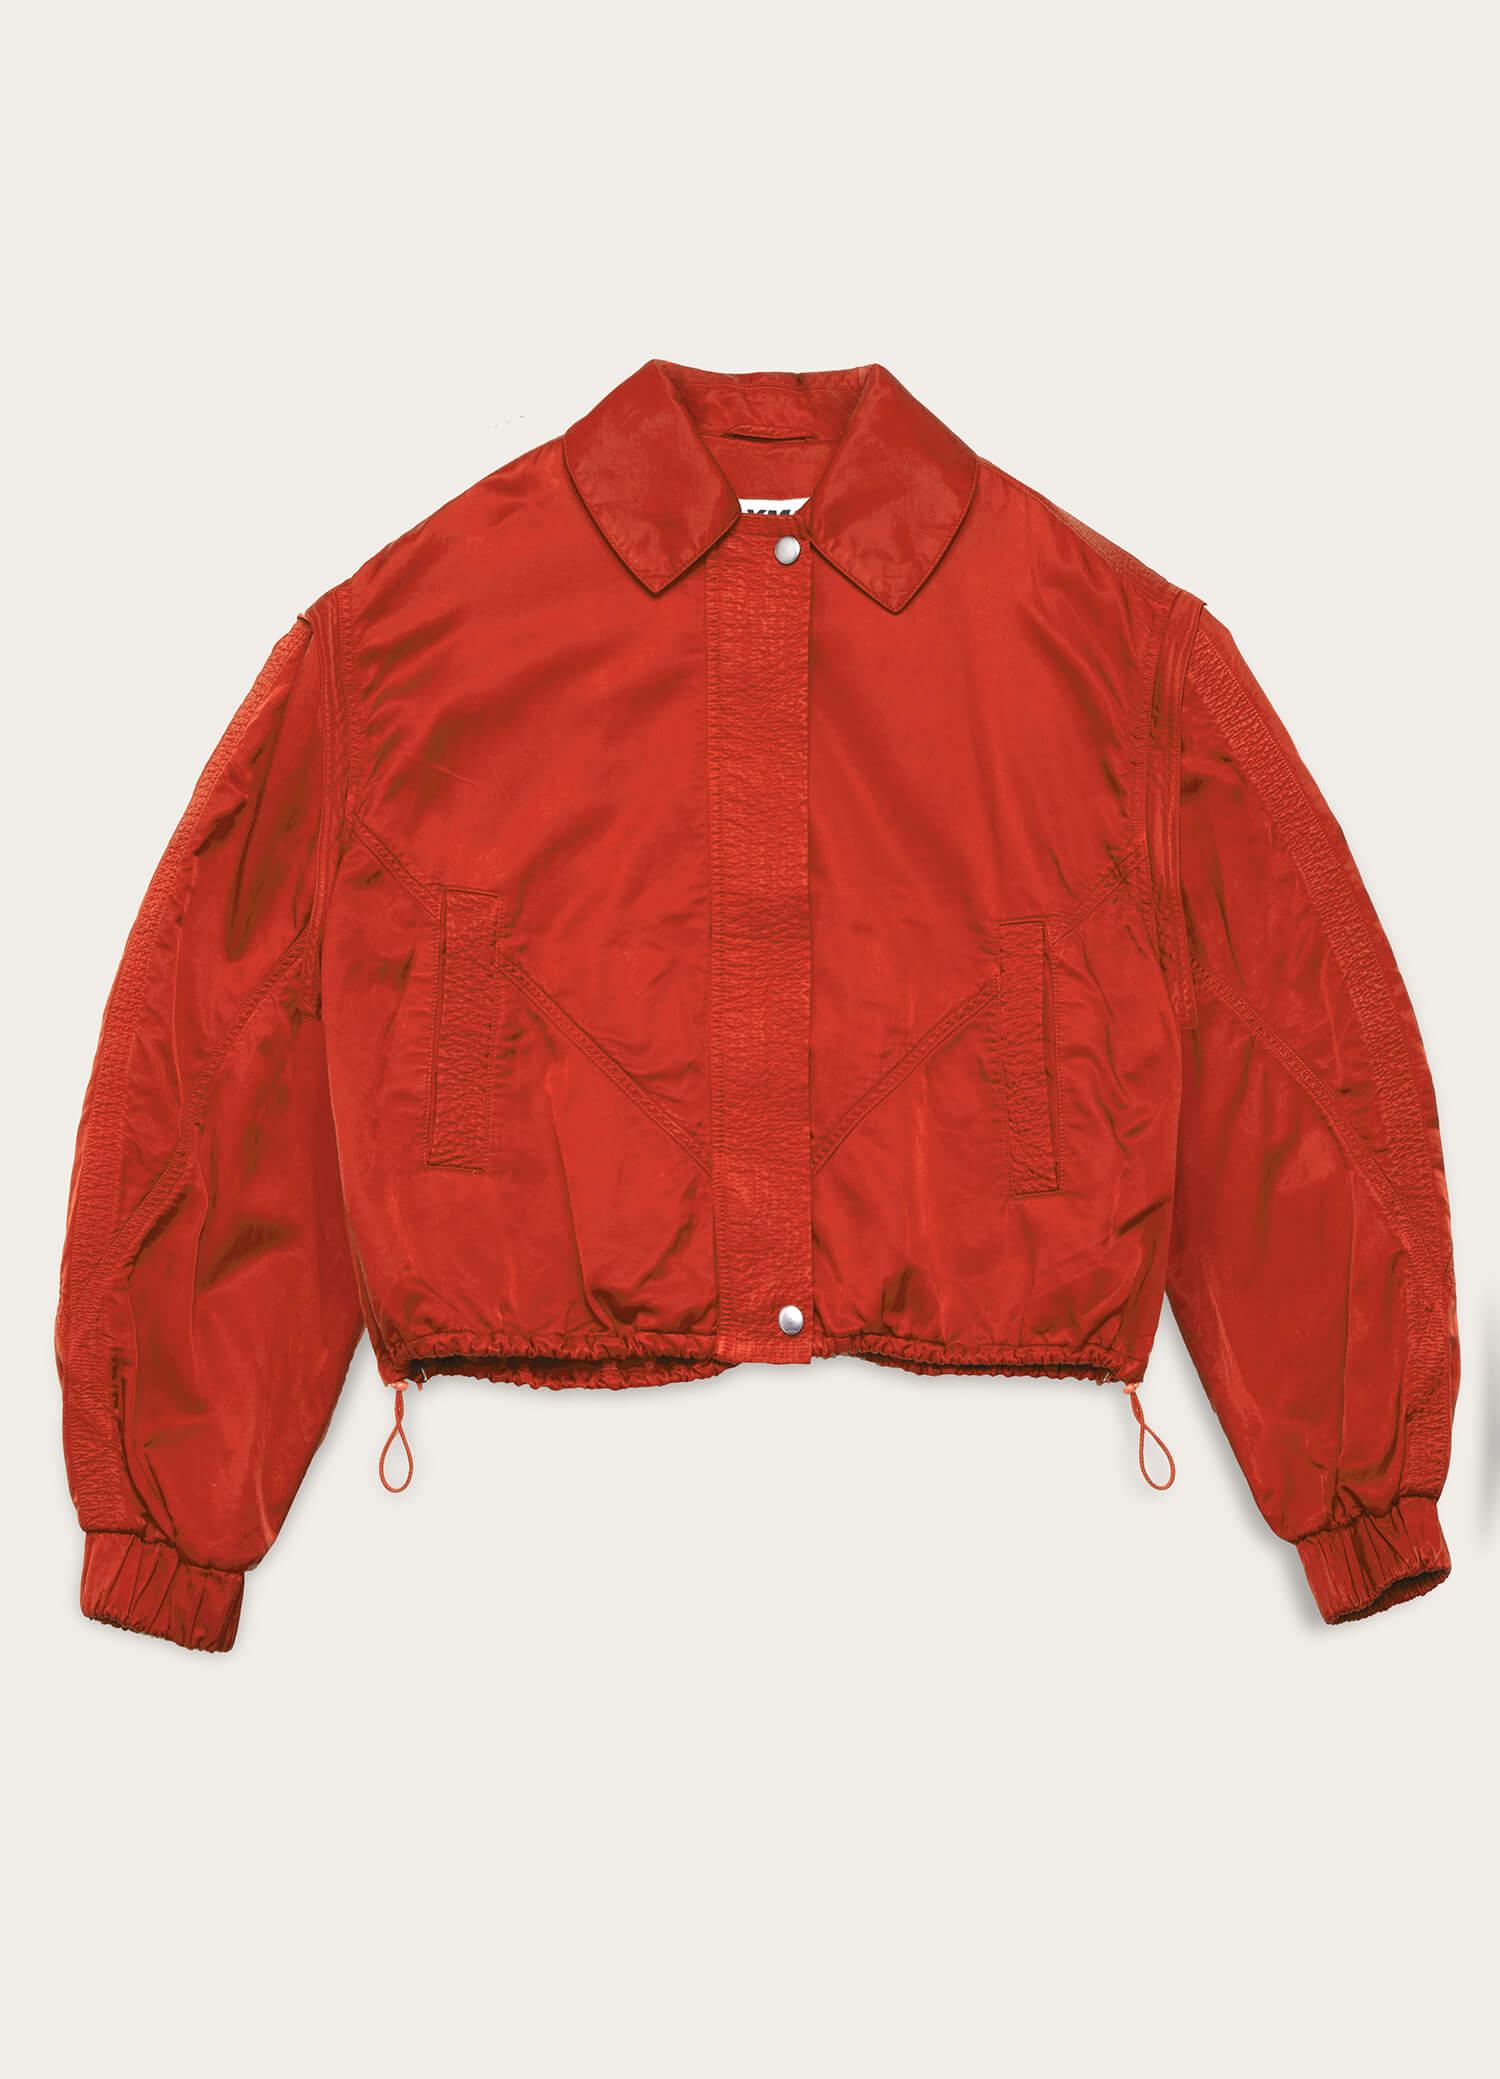 Heath Bonded Cotton Jacket Red